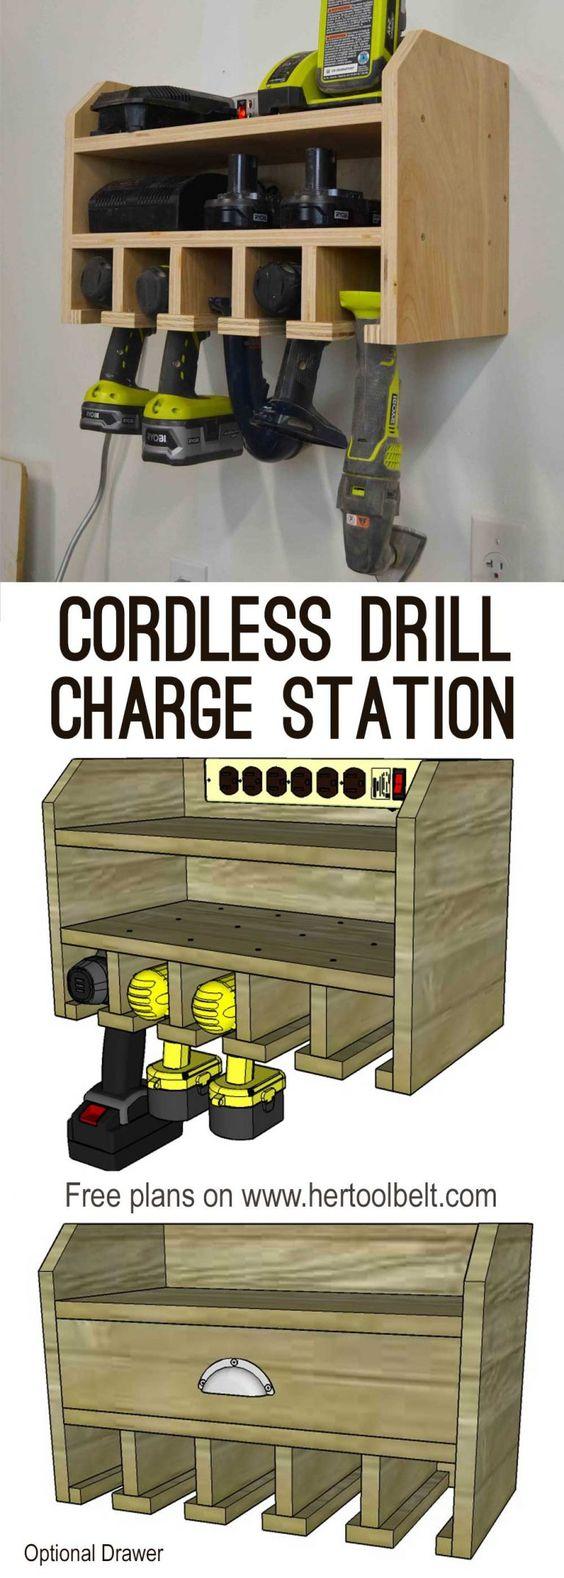 Cordless Drill Storage.